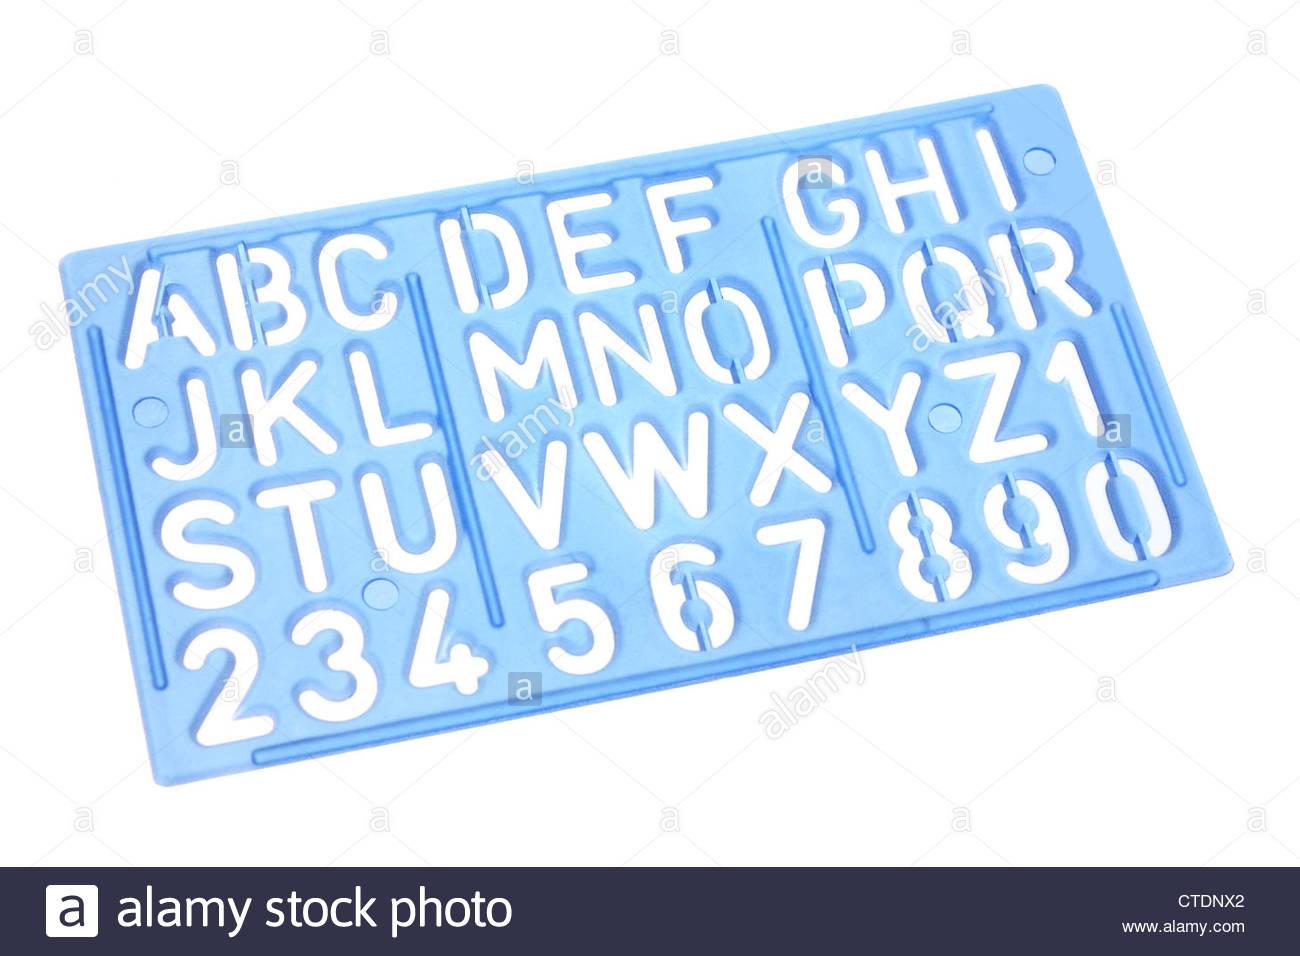 Alphabet Stencil Stock Photo - Alamy throughout Alphabet Tracing Stencils